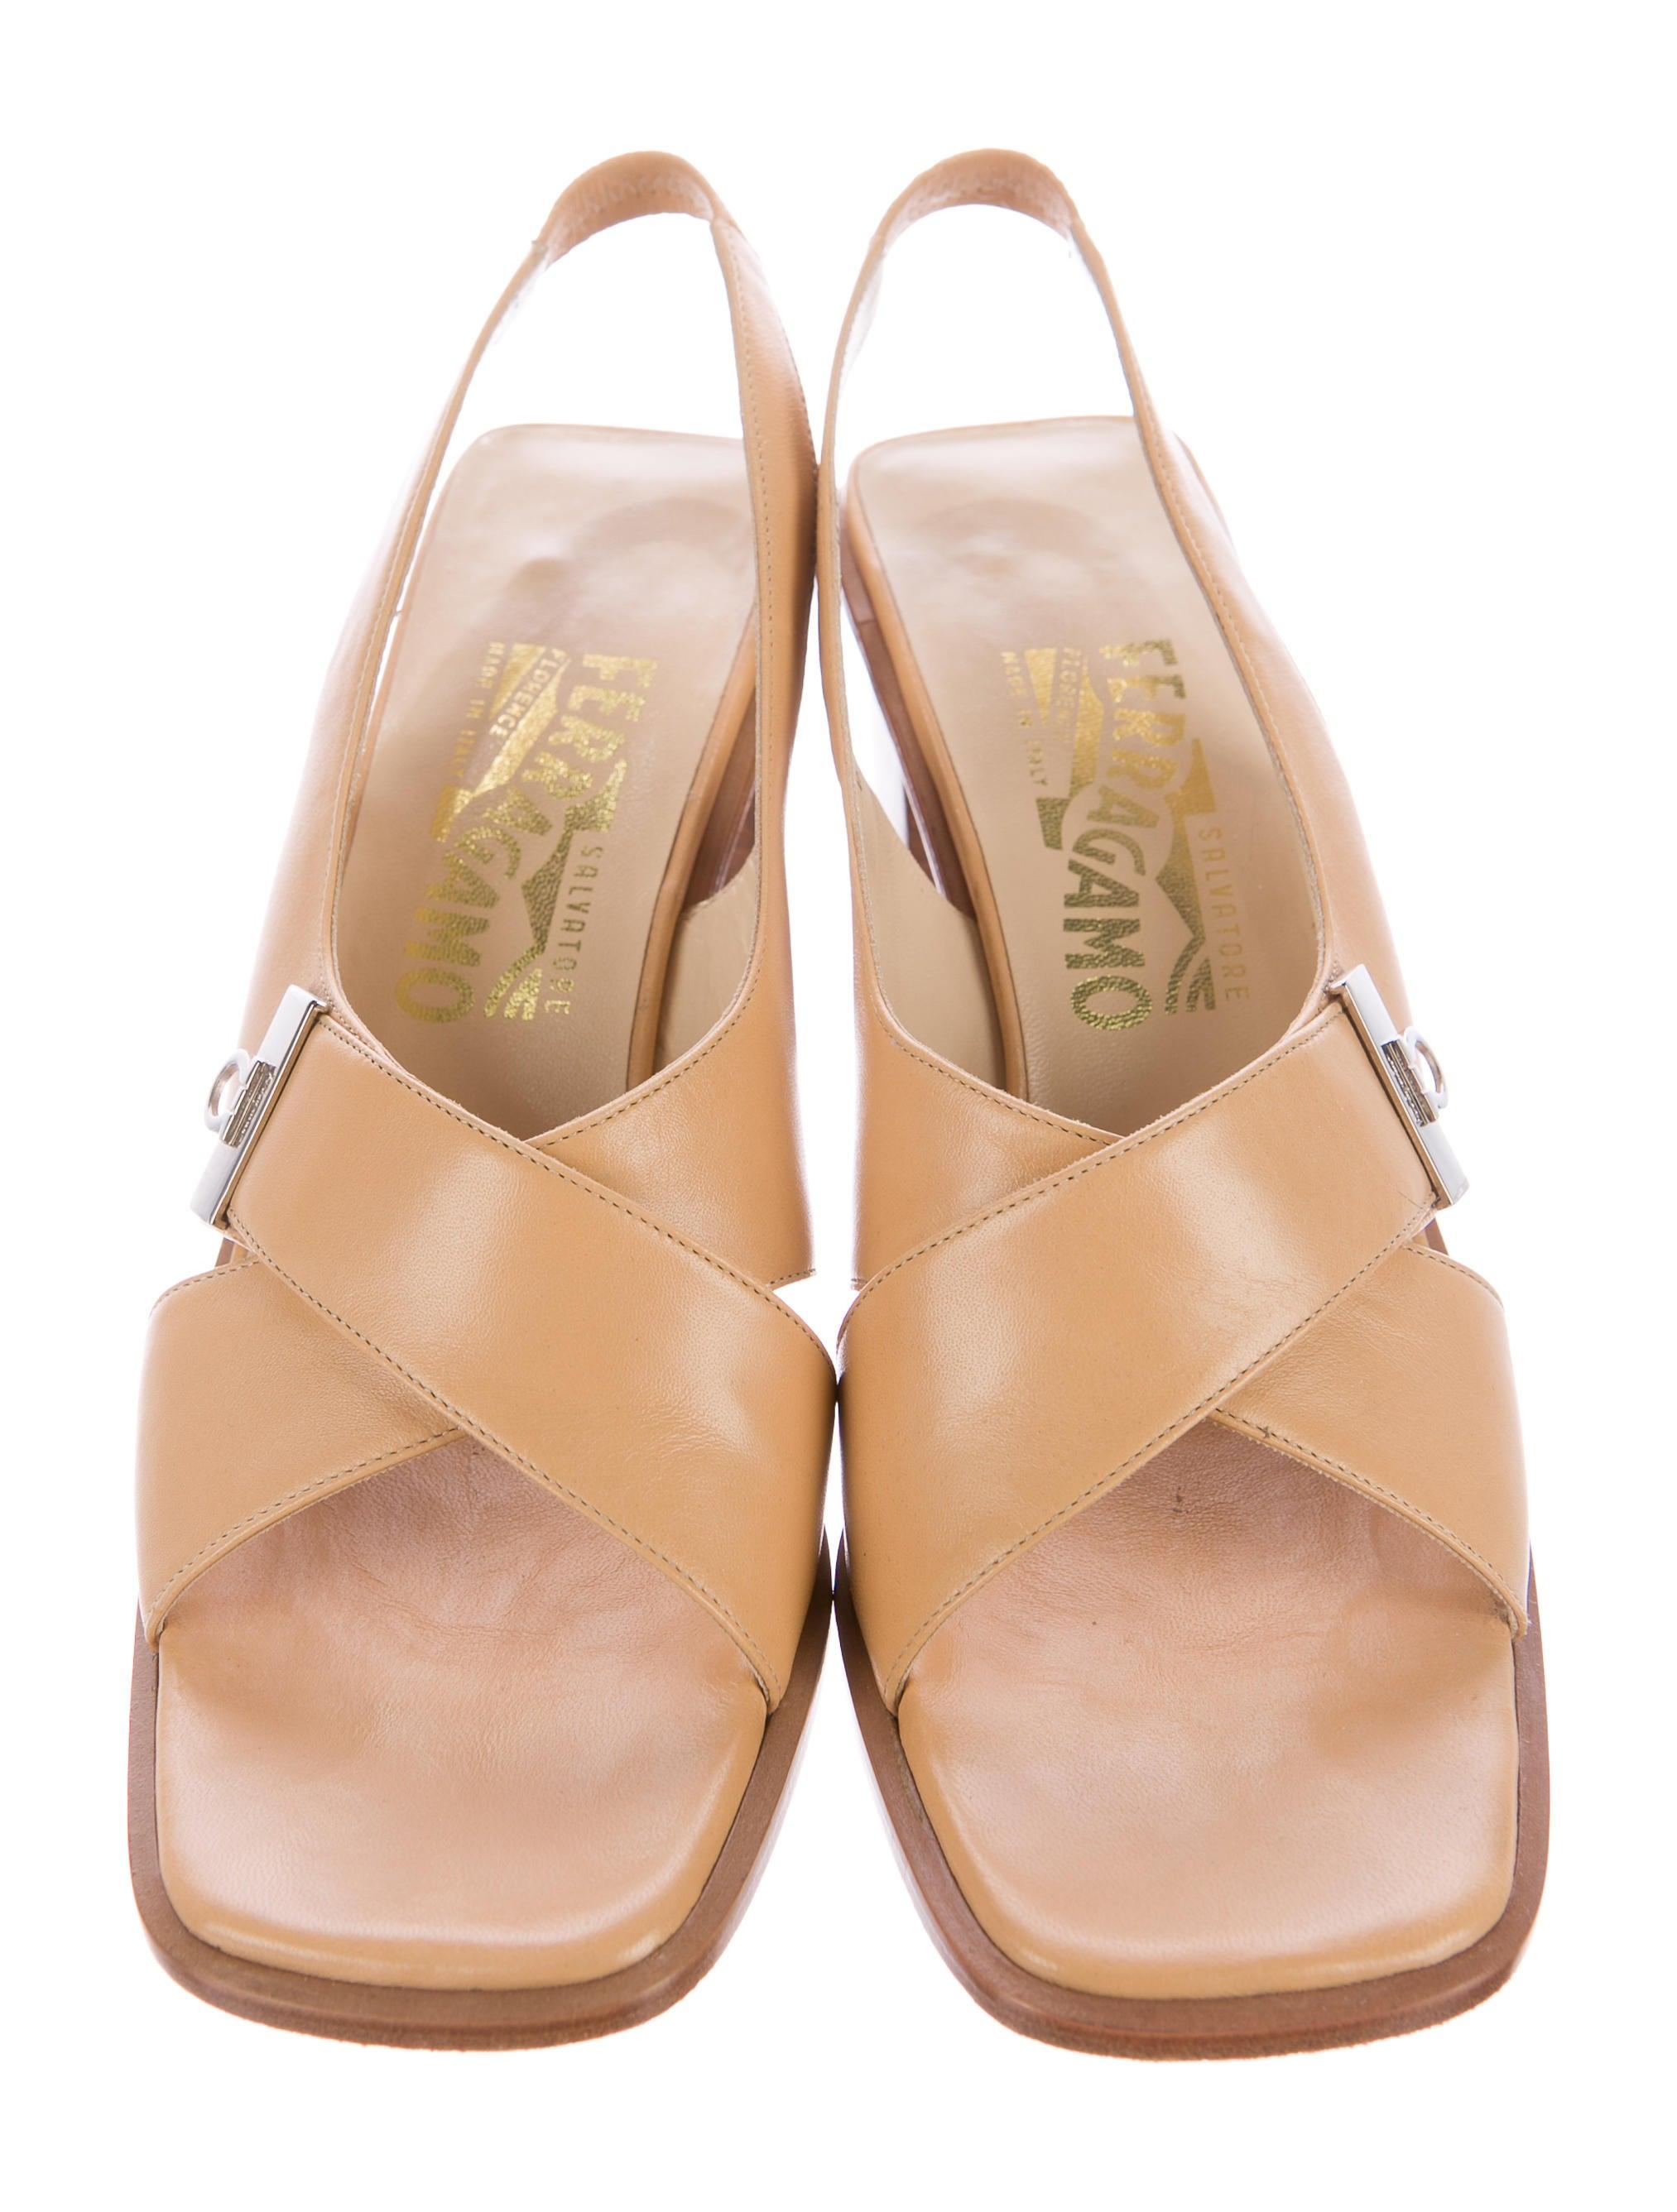 Ferragamo Leather Shoe Women